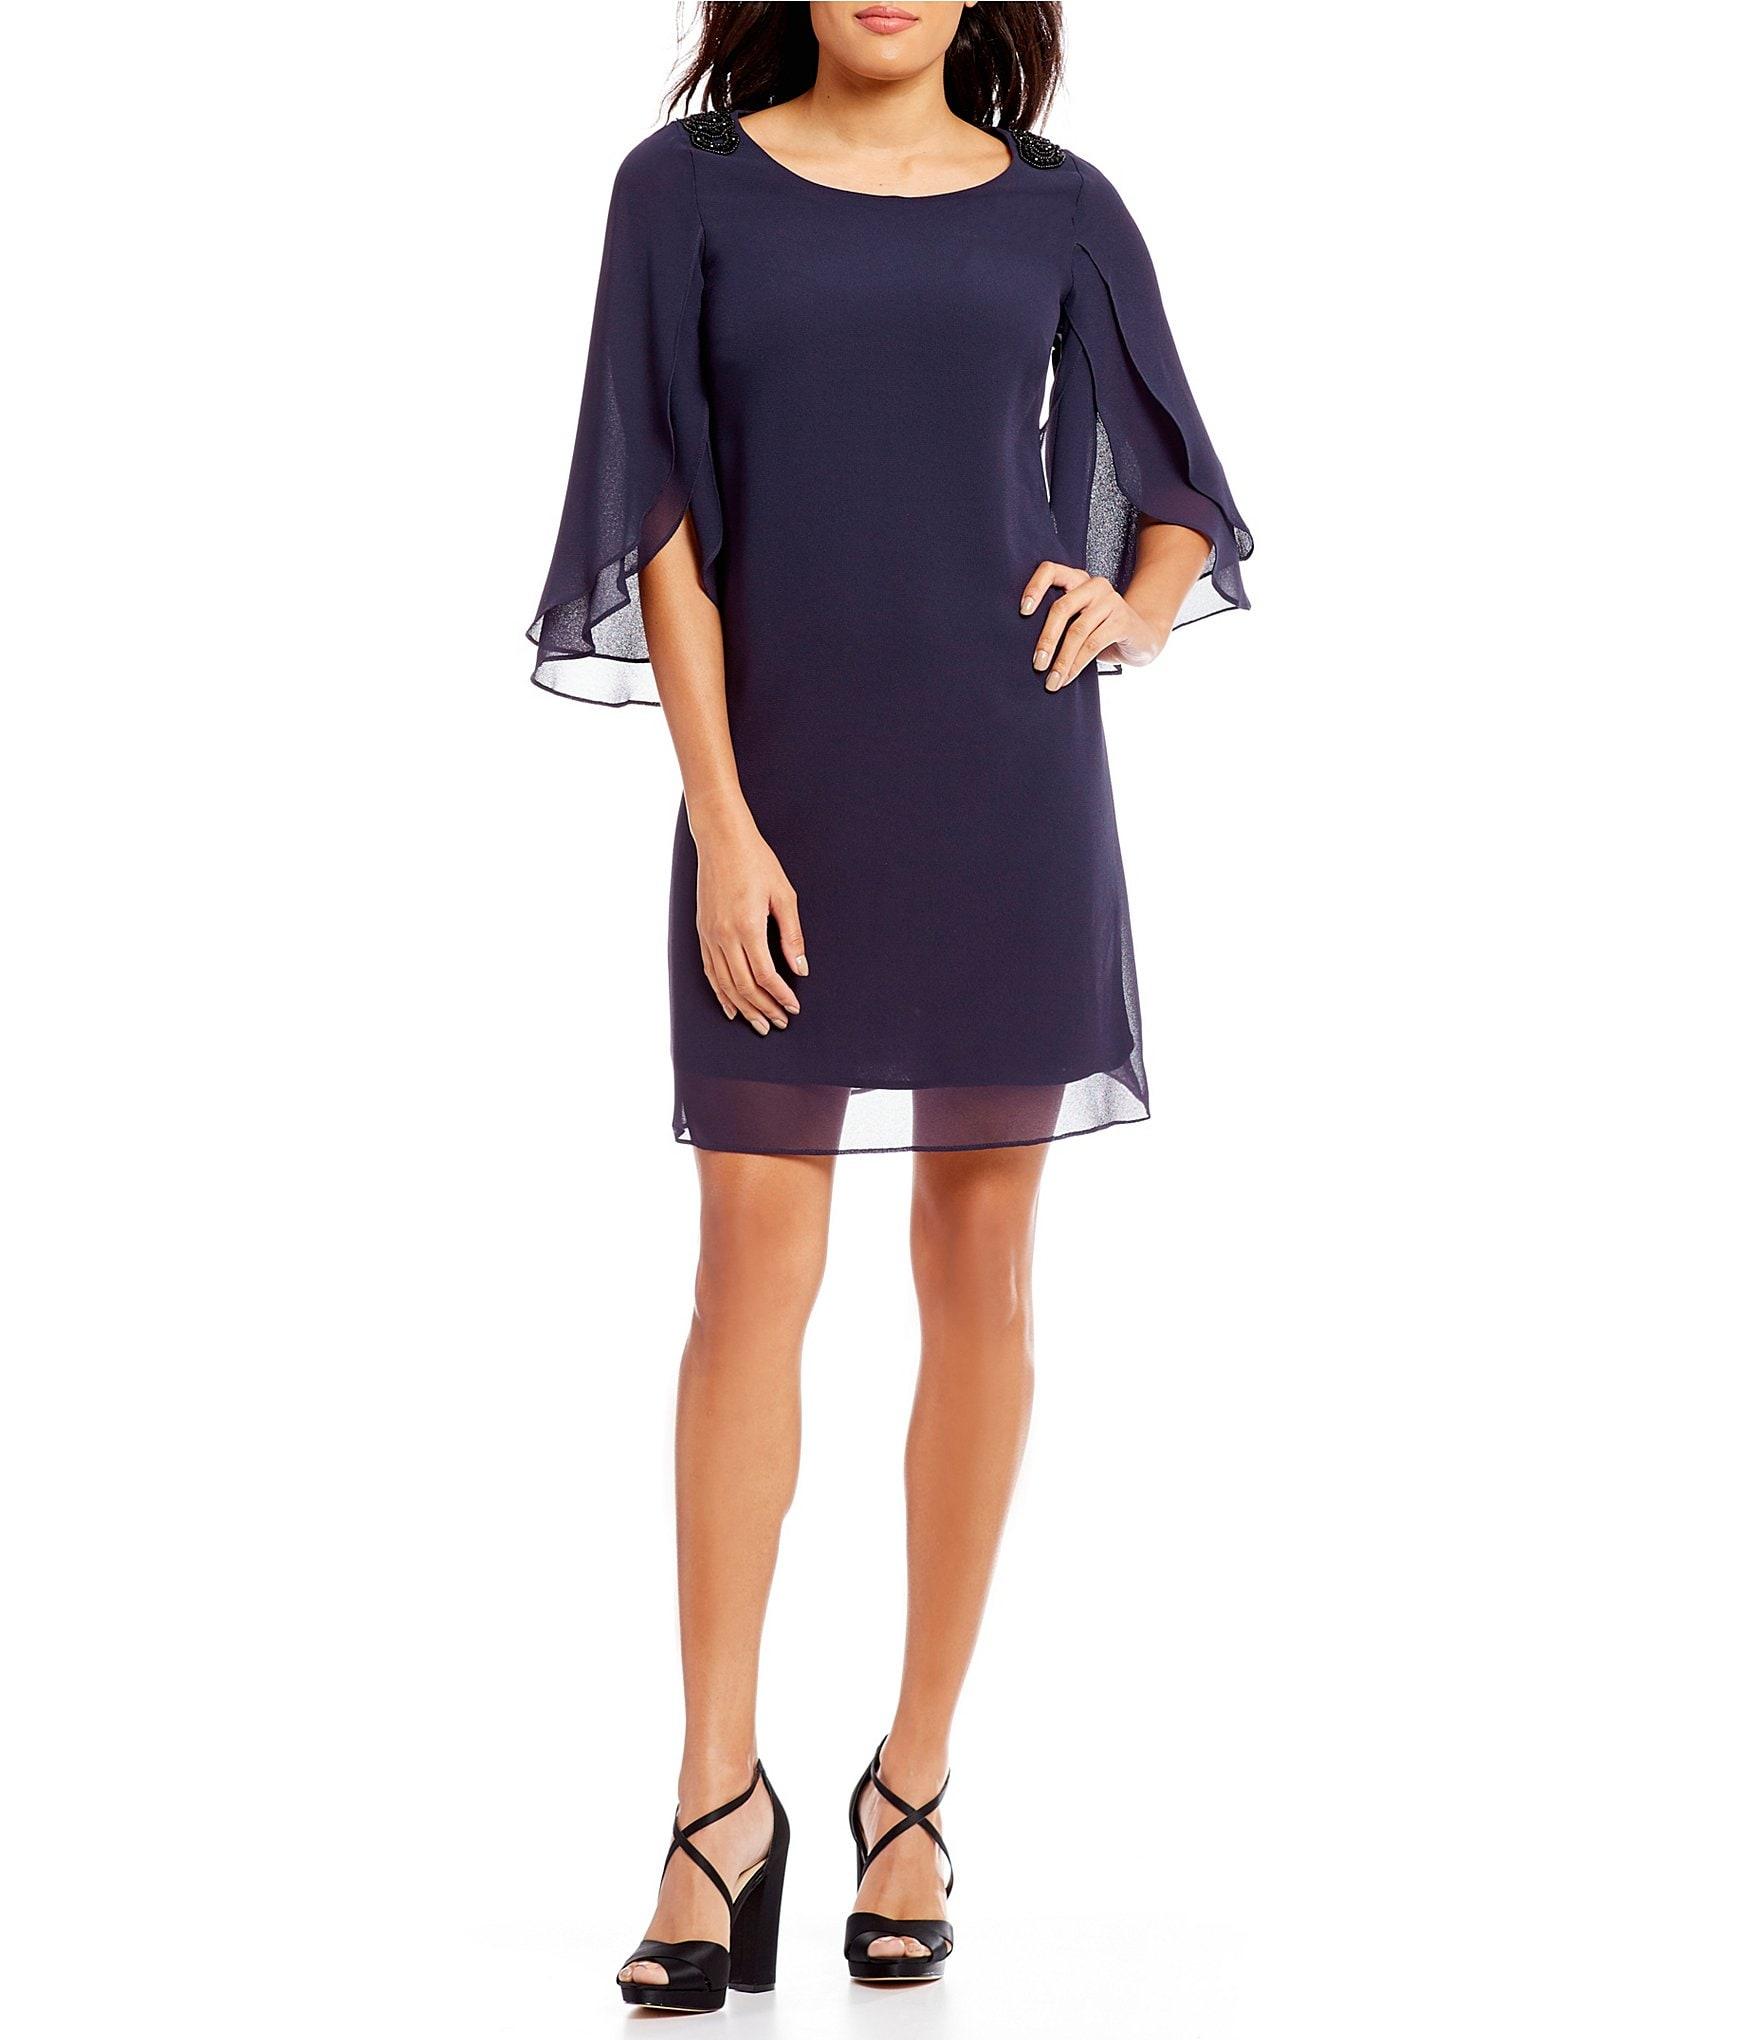 Sl sl fashion dresses - Sl Sl Fashion Dresses 27